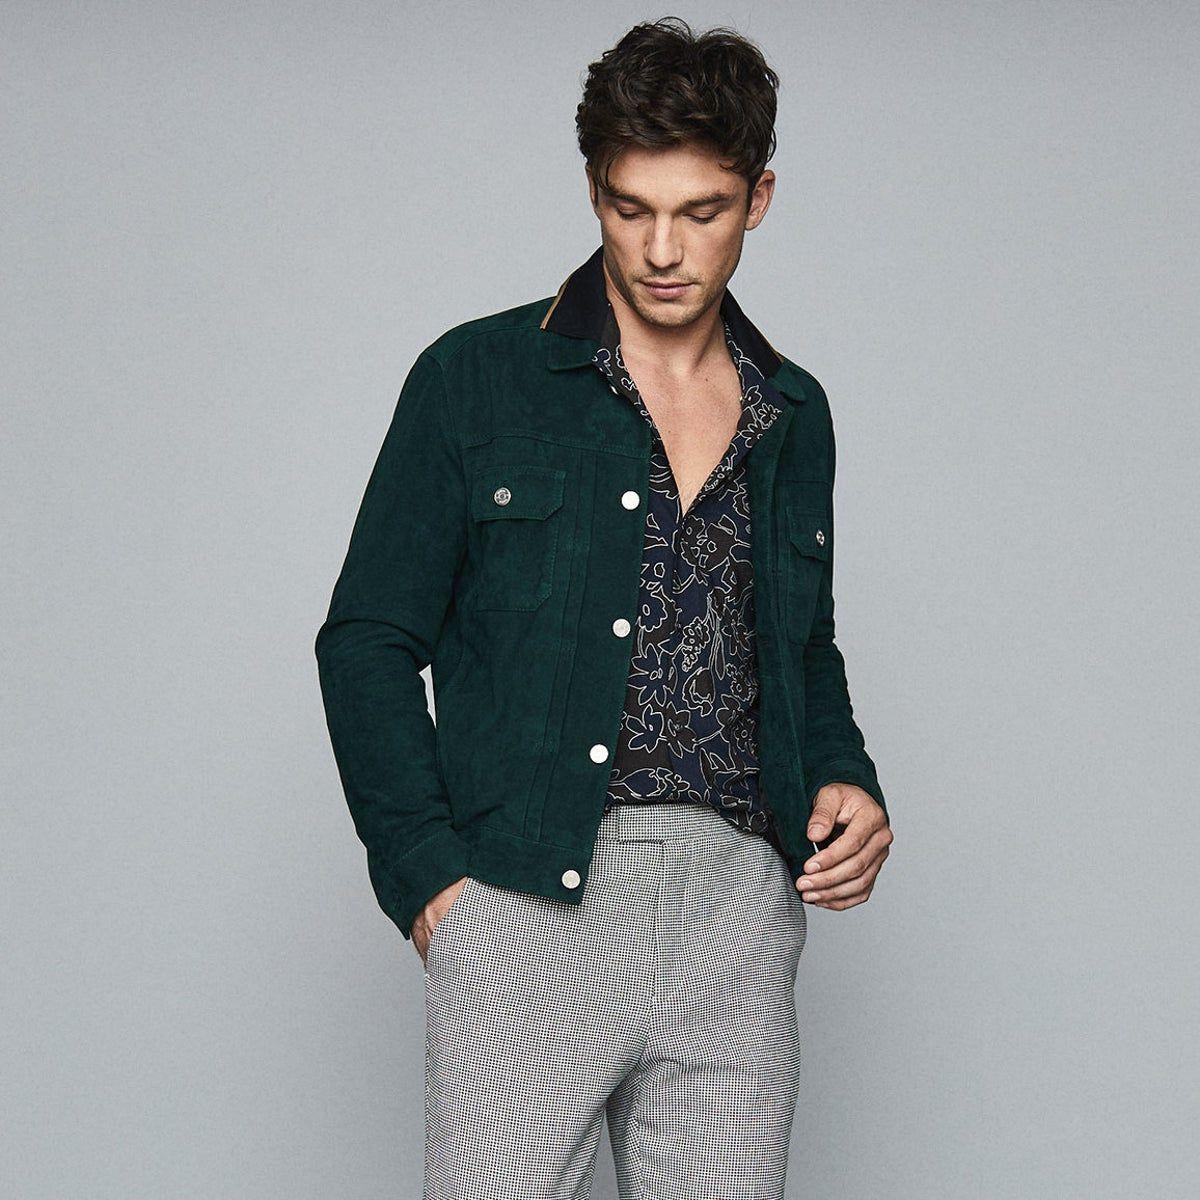 Scott Teal Suede Western Jacket Reiss Mens Clothing Styles Outerwear Jackets Western Jacket [ 1200 x 1200 Pixel ]